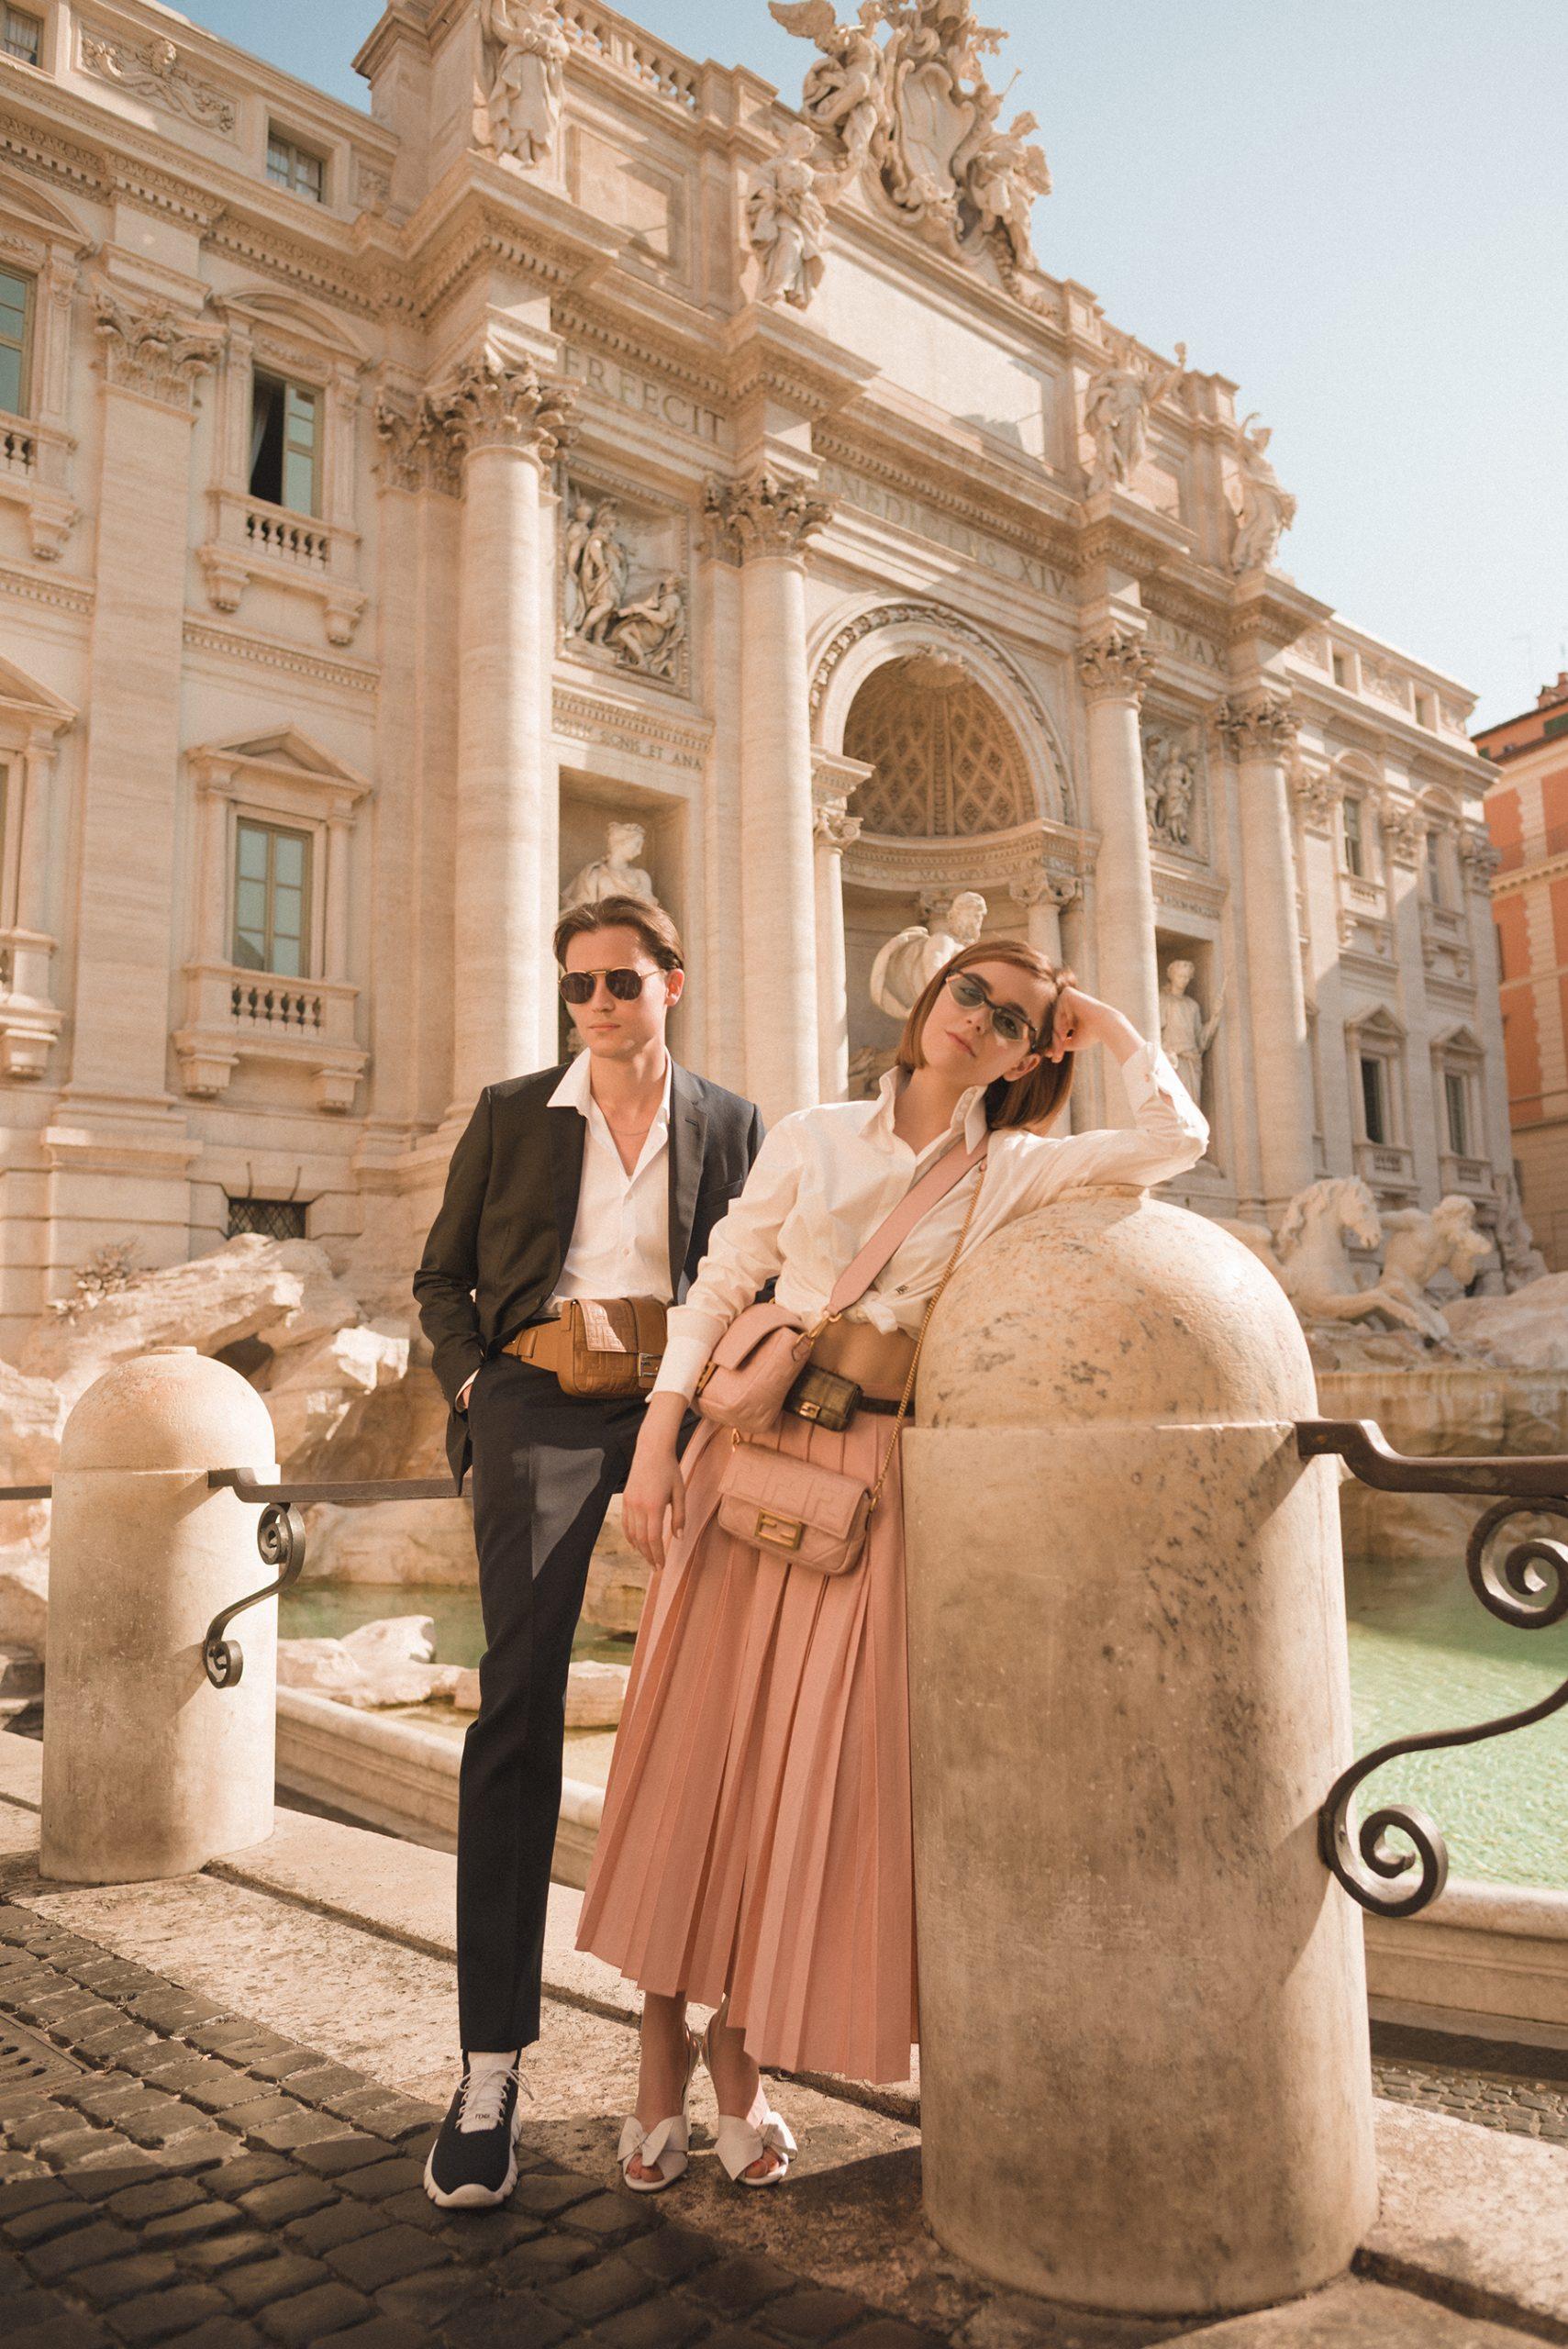 Fendi Roman Holiday Campaign with Kiernan Shipka